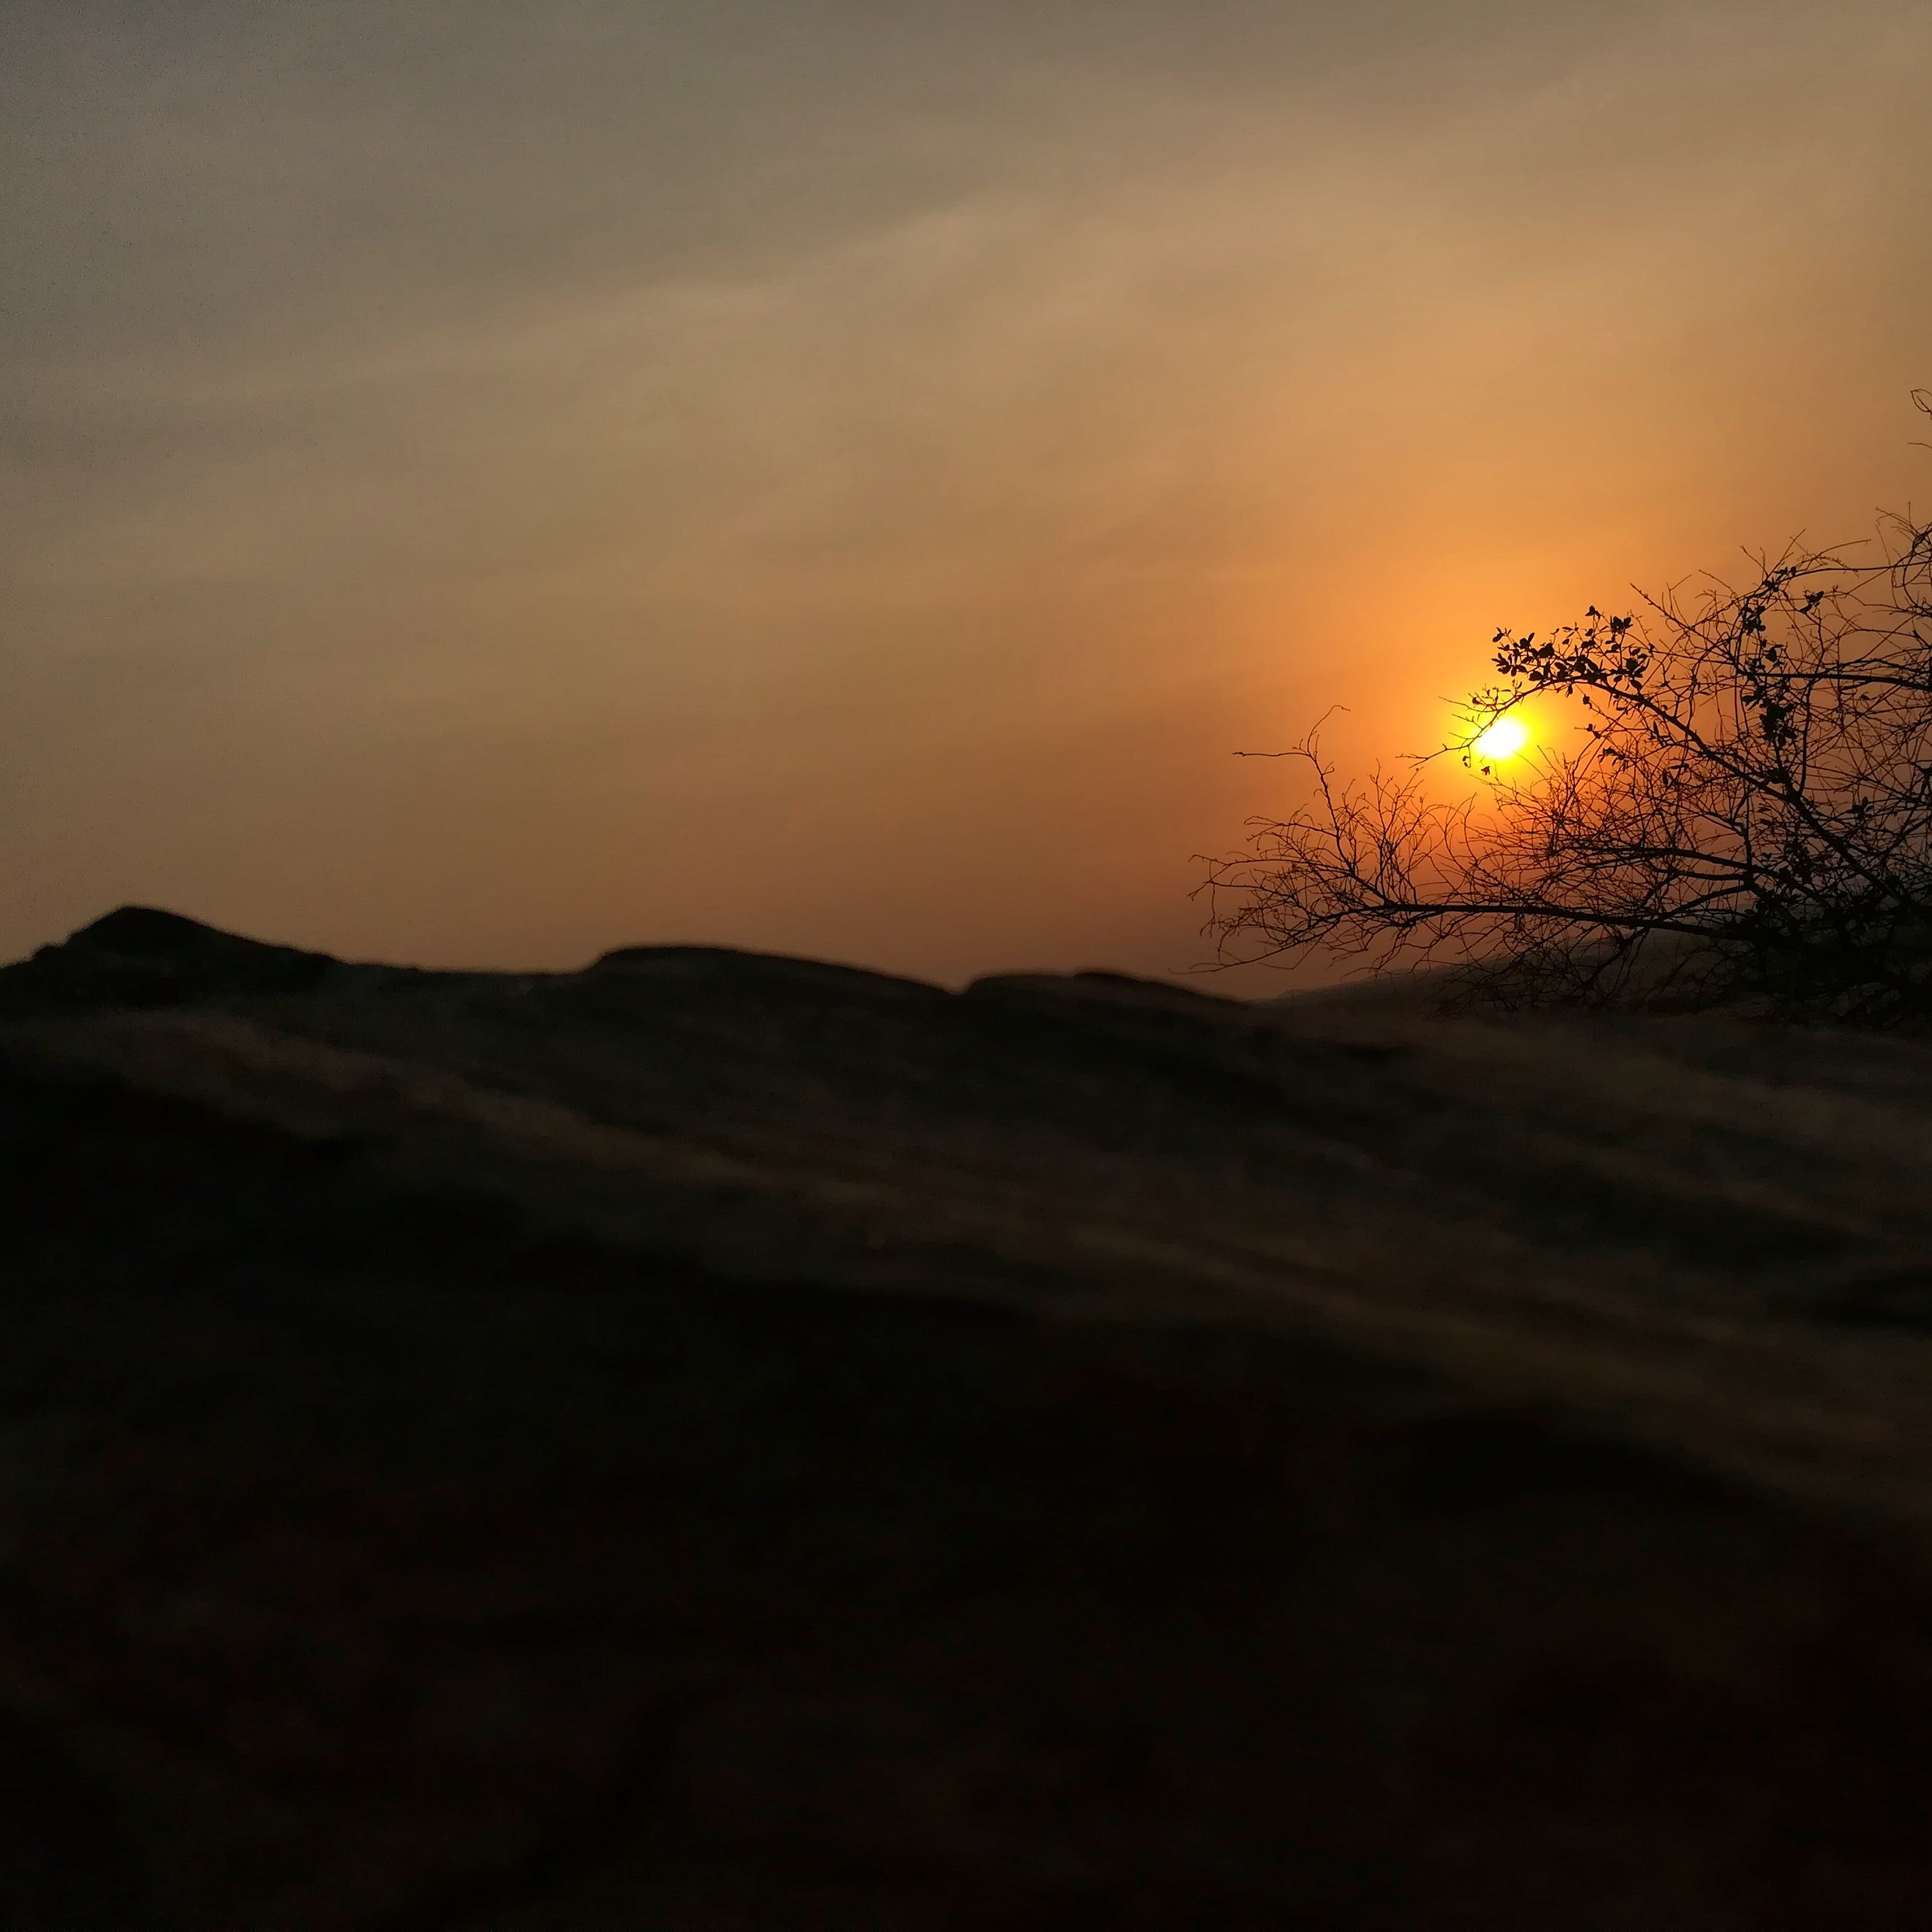 Free stock photo of rocks, Shaded tree, sunset